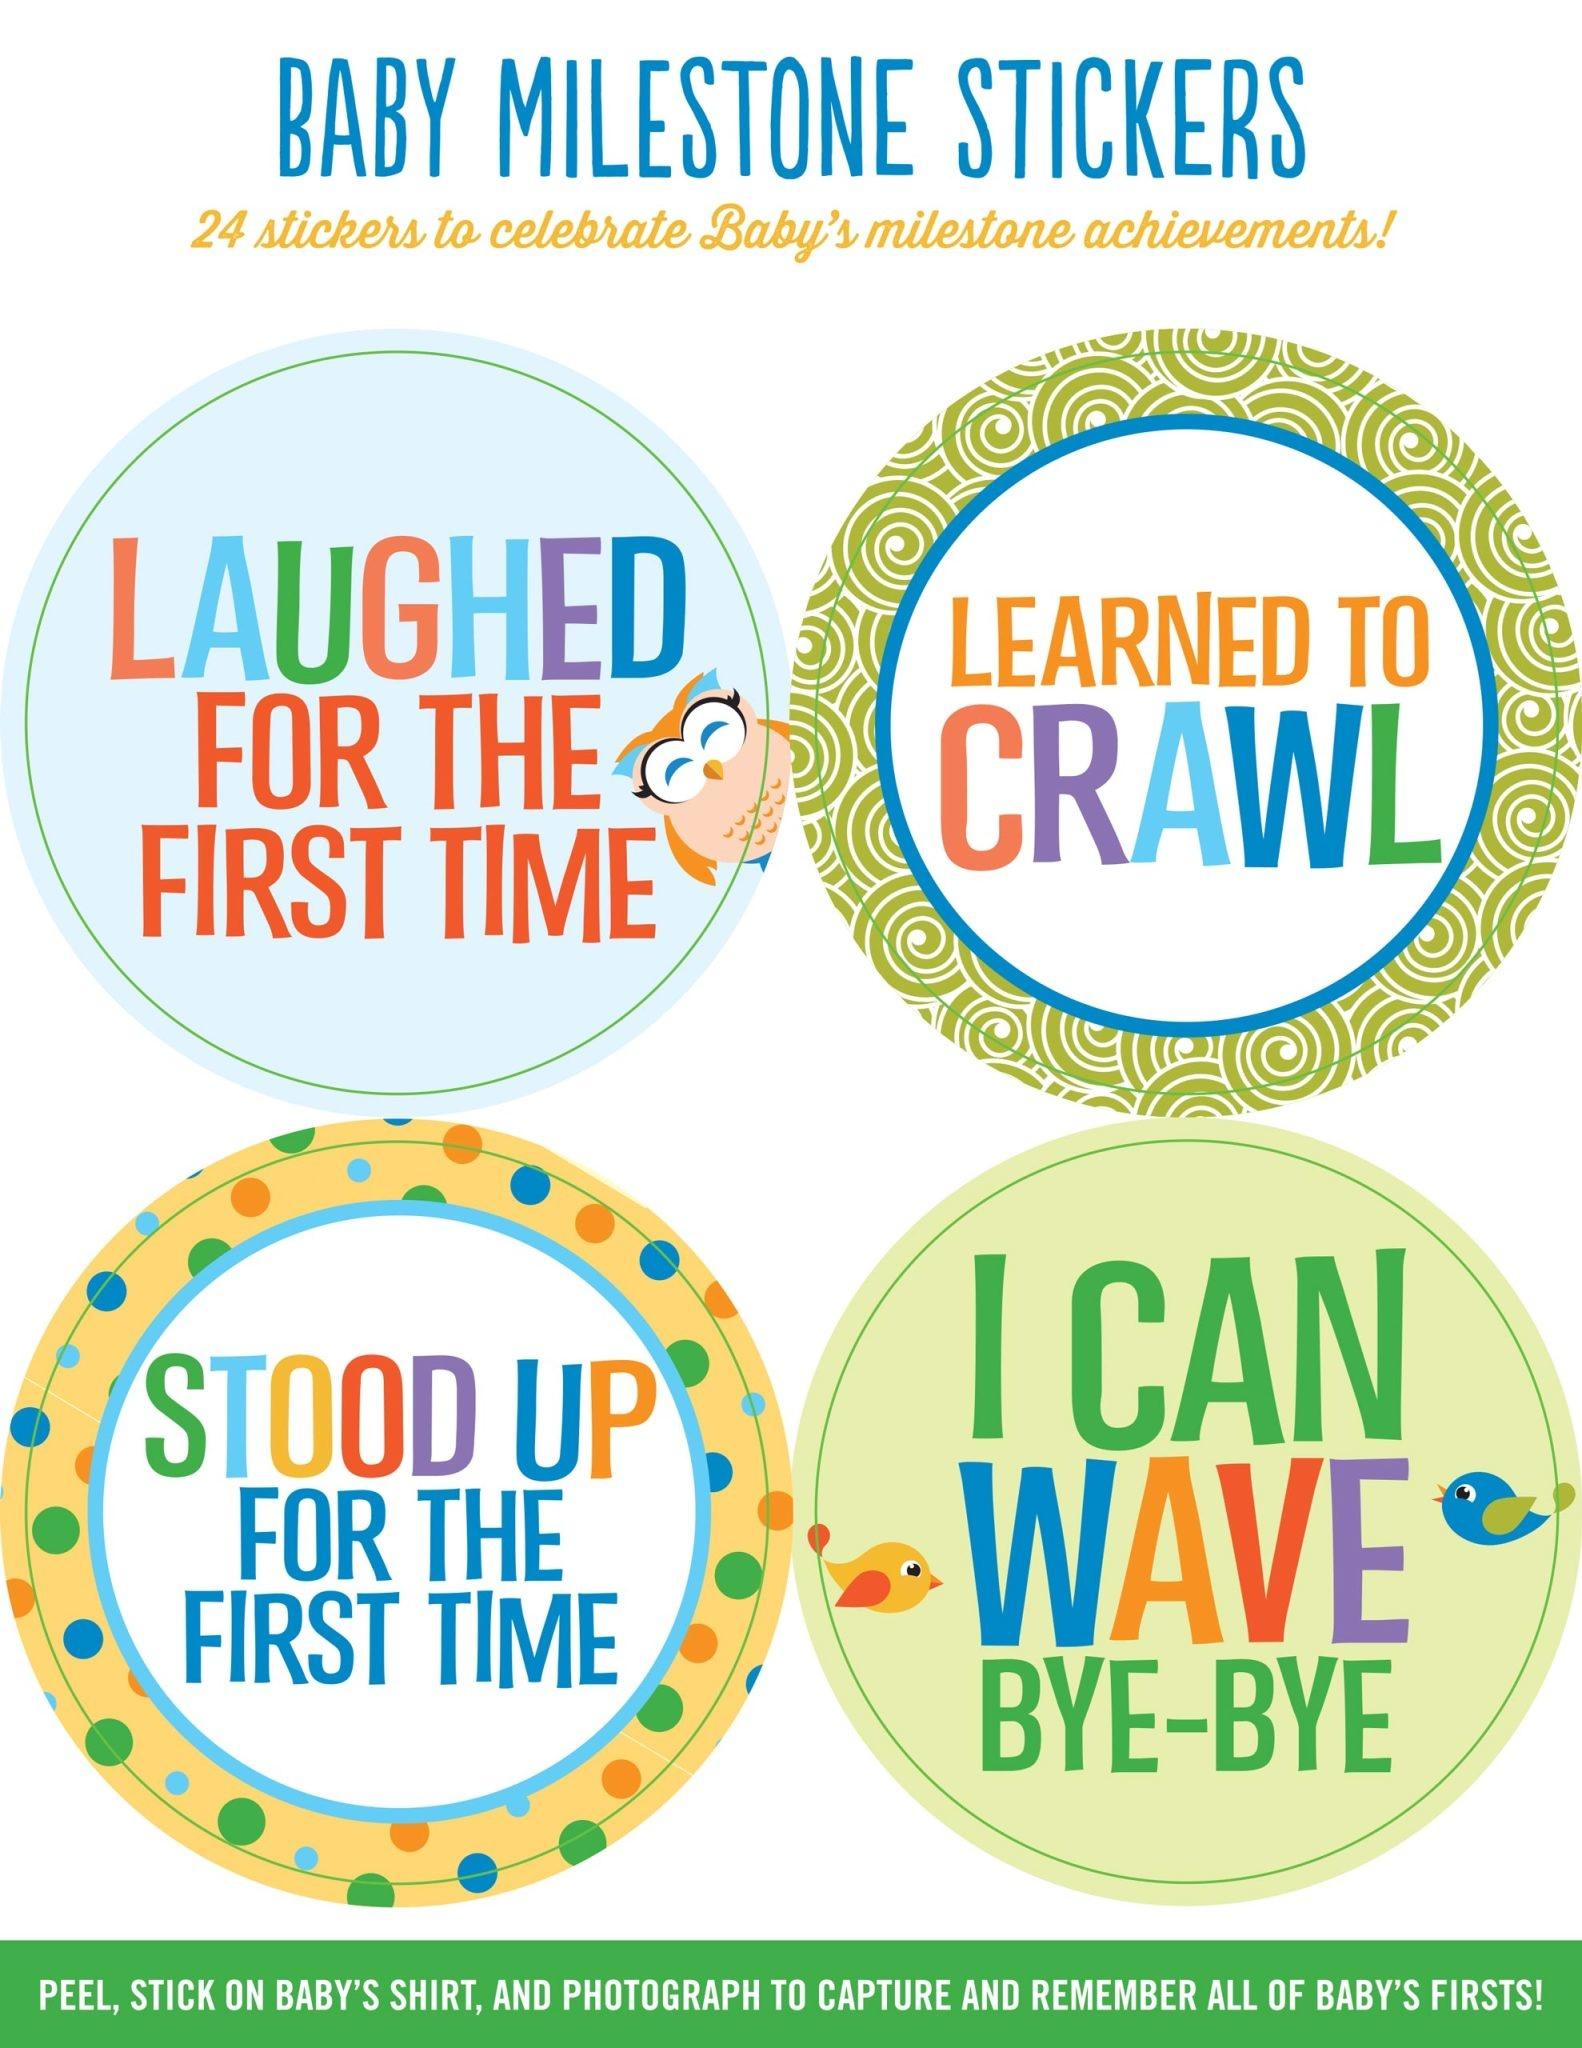 Fleurish Home Baby Milestone Stickers *last chance